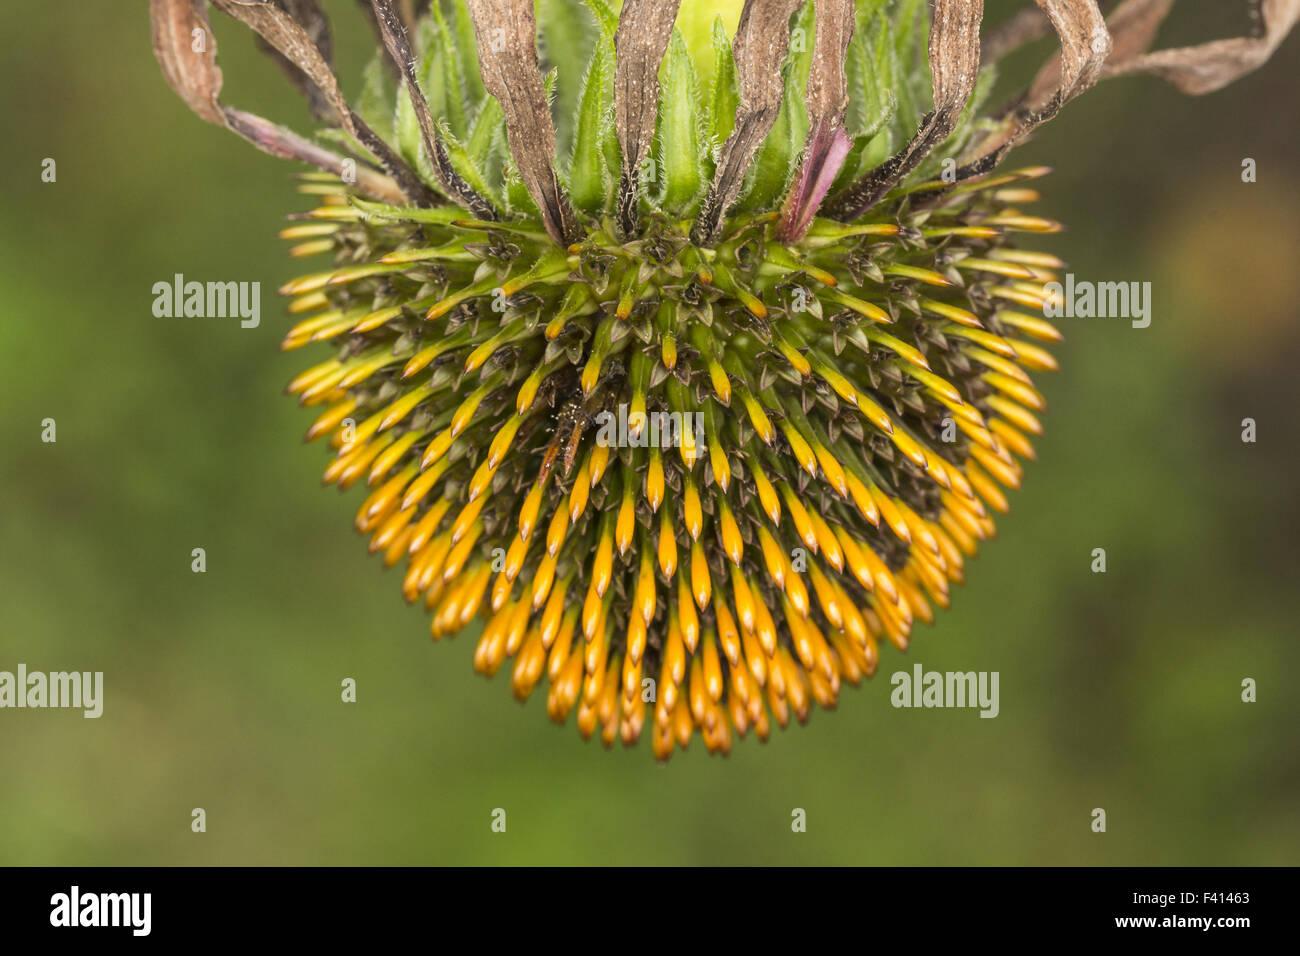 Echinacea purpurea, Eastern purple coneflower - Stock Image